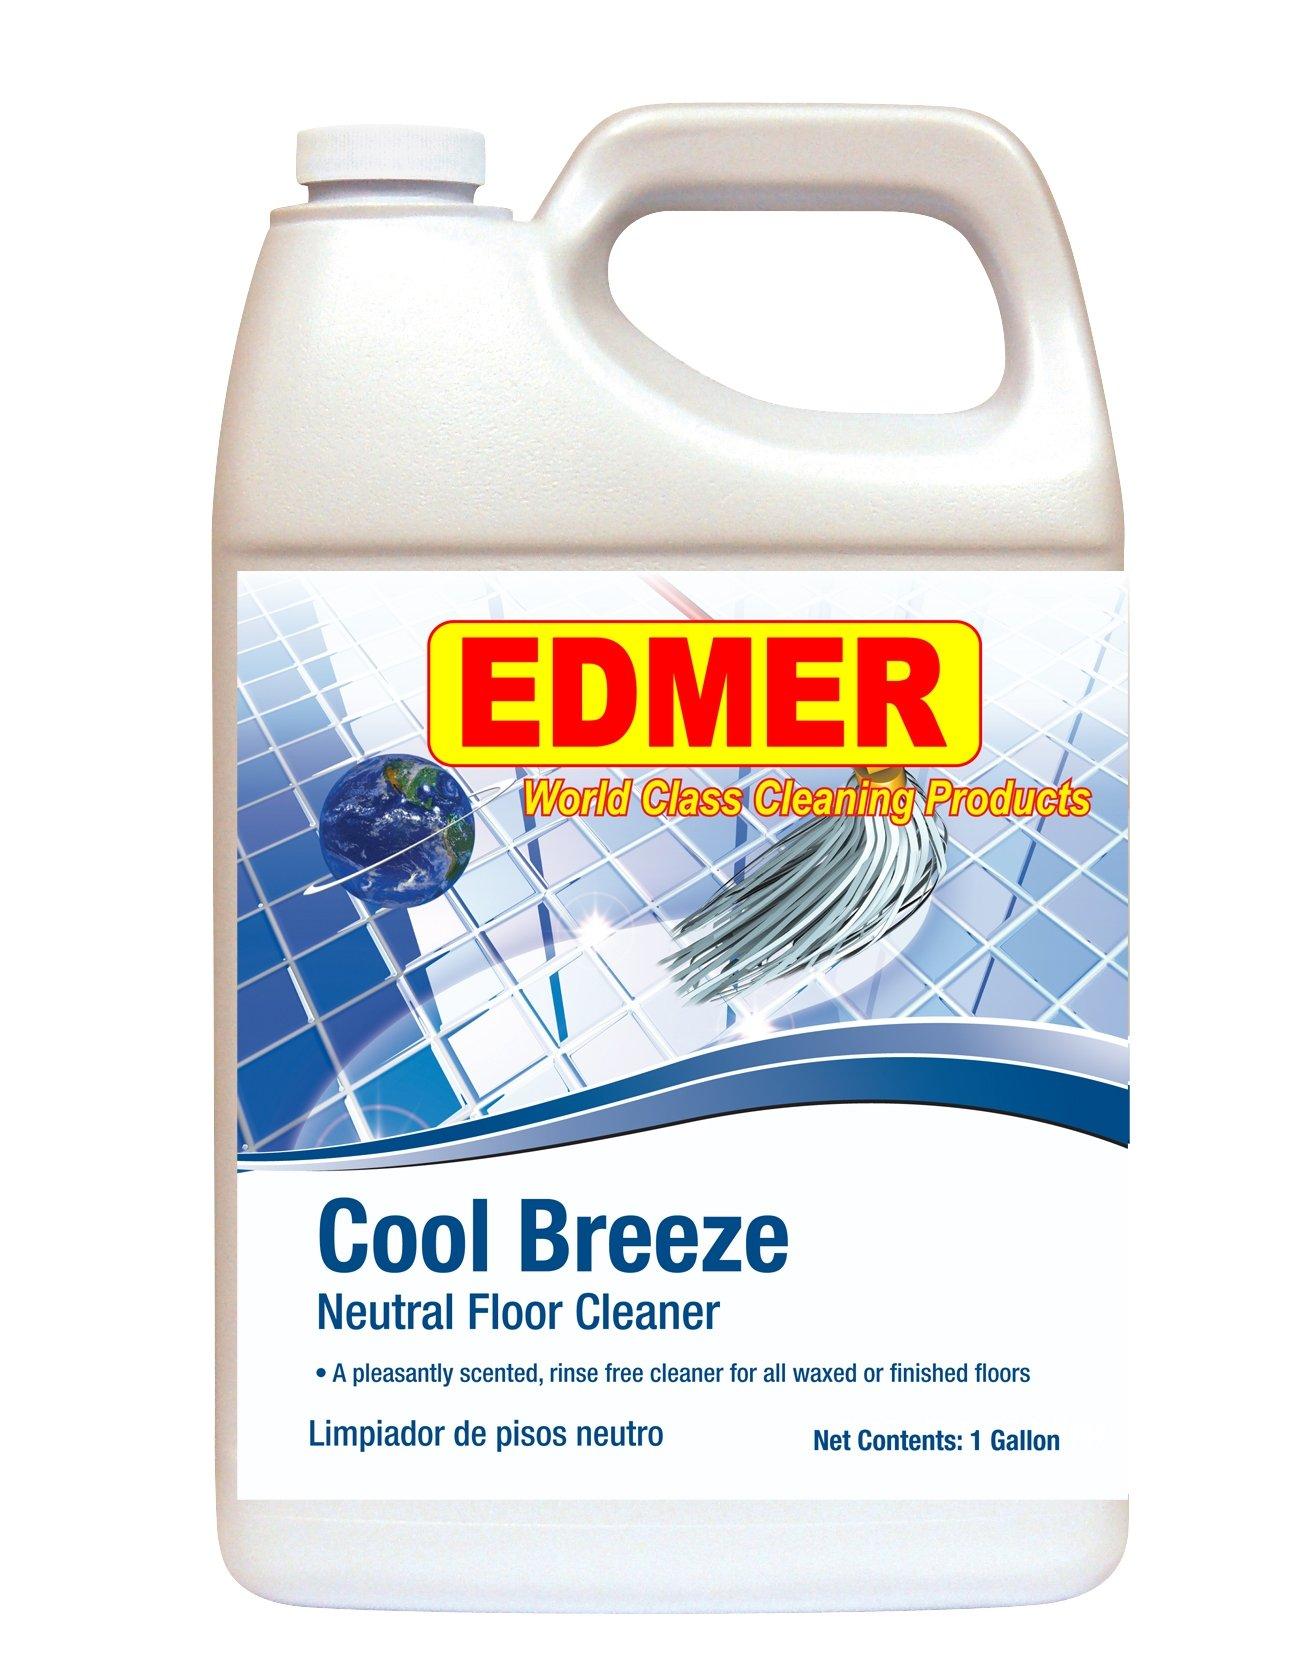 Edmer Cool Breeze Neutral Floor Cleaner - 4 gallons per case